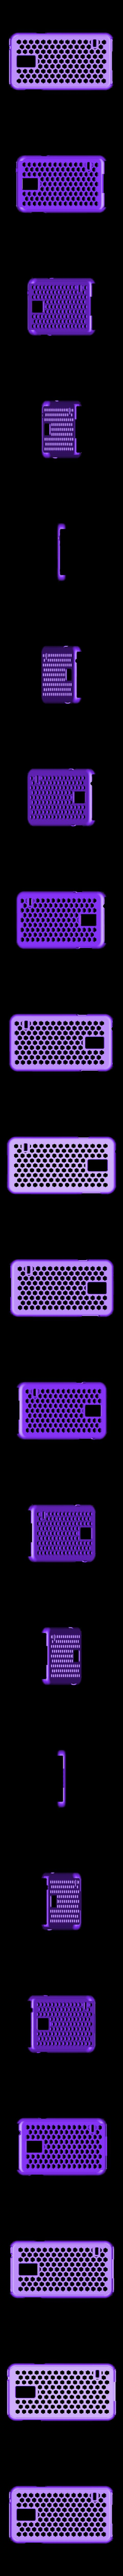 S5_rev4-3_Hex.stl Download free STL file Galaxy S5 Hard Case • Design to 3D print, Umqais